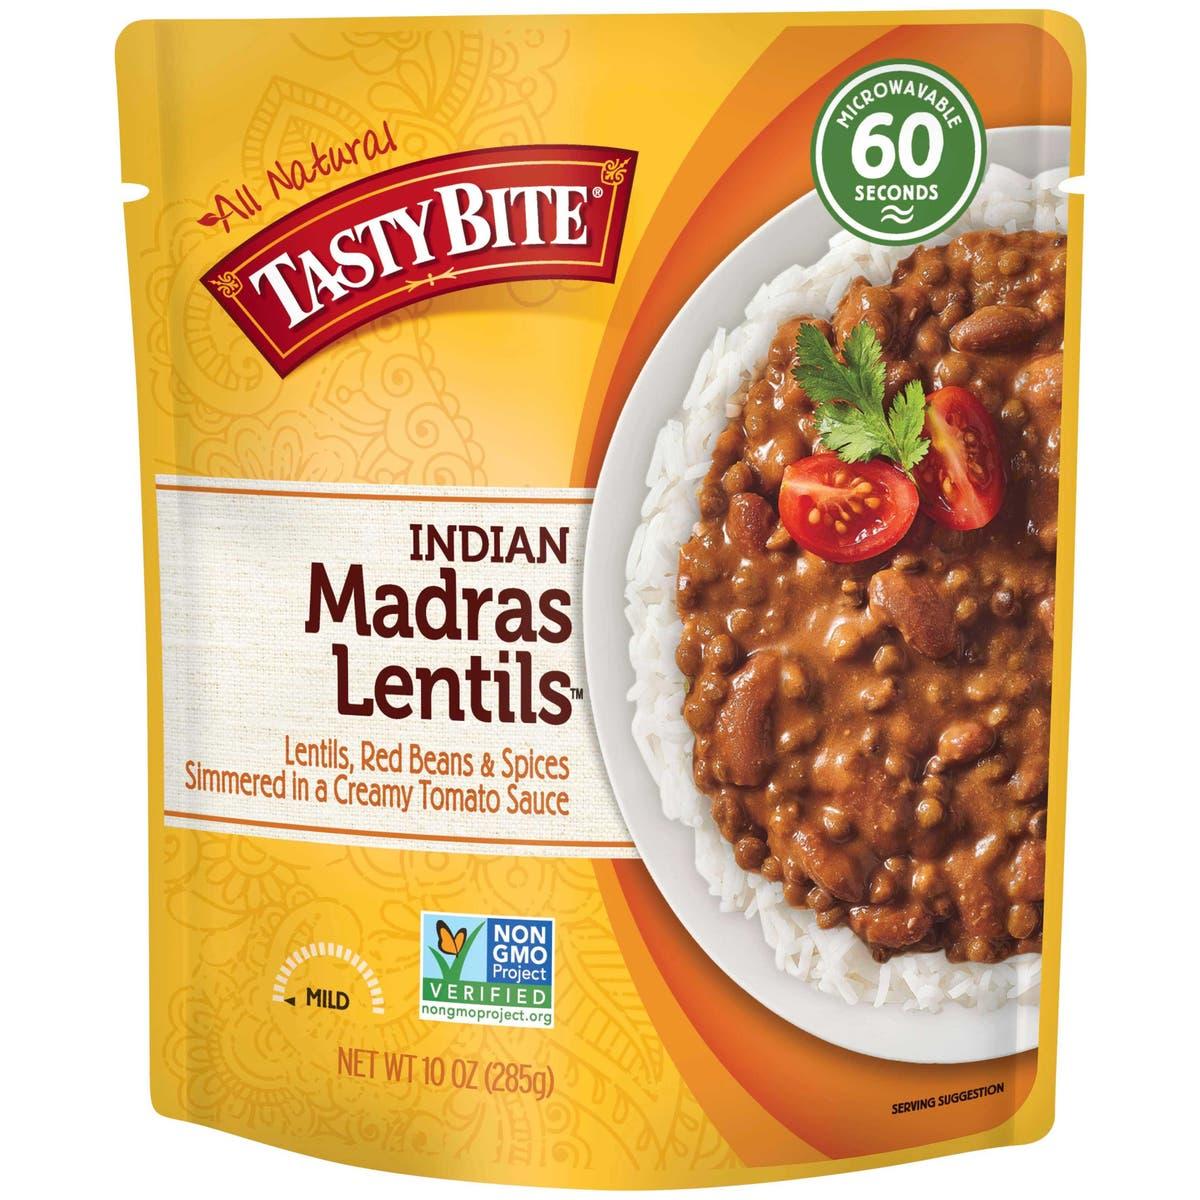 Tasty Bite Organic Indian Madras Lentils-front